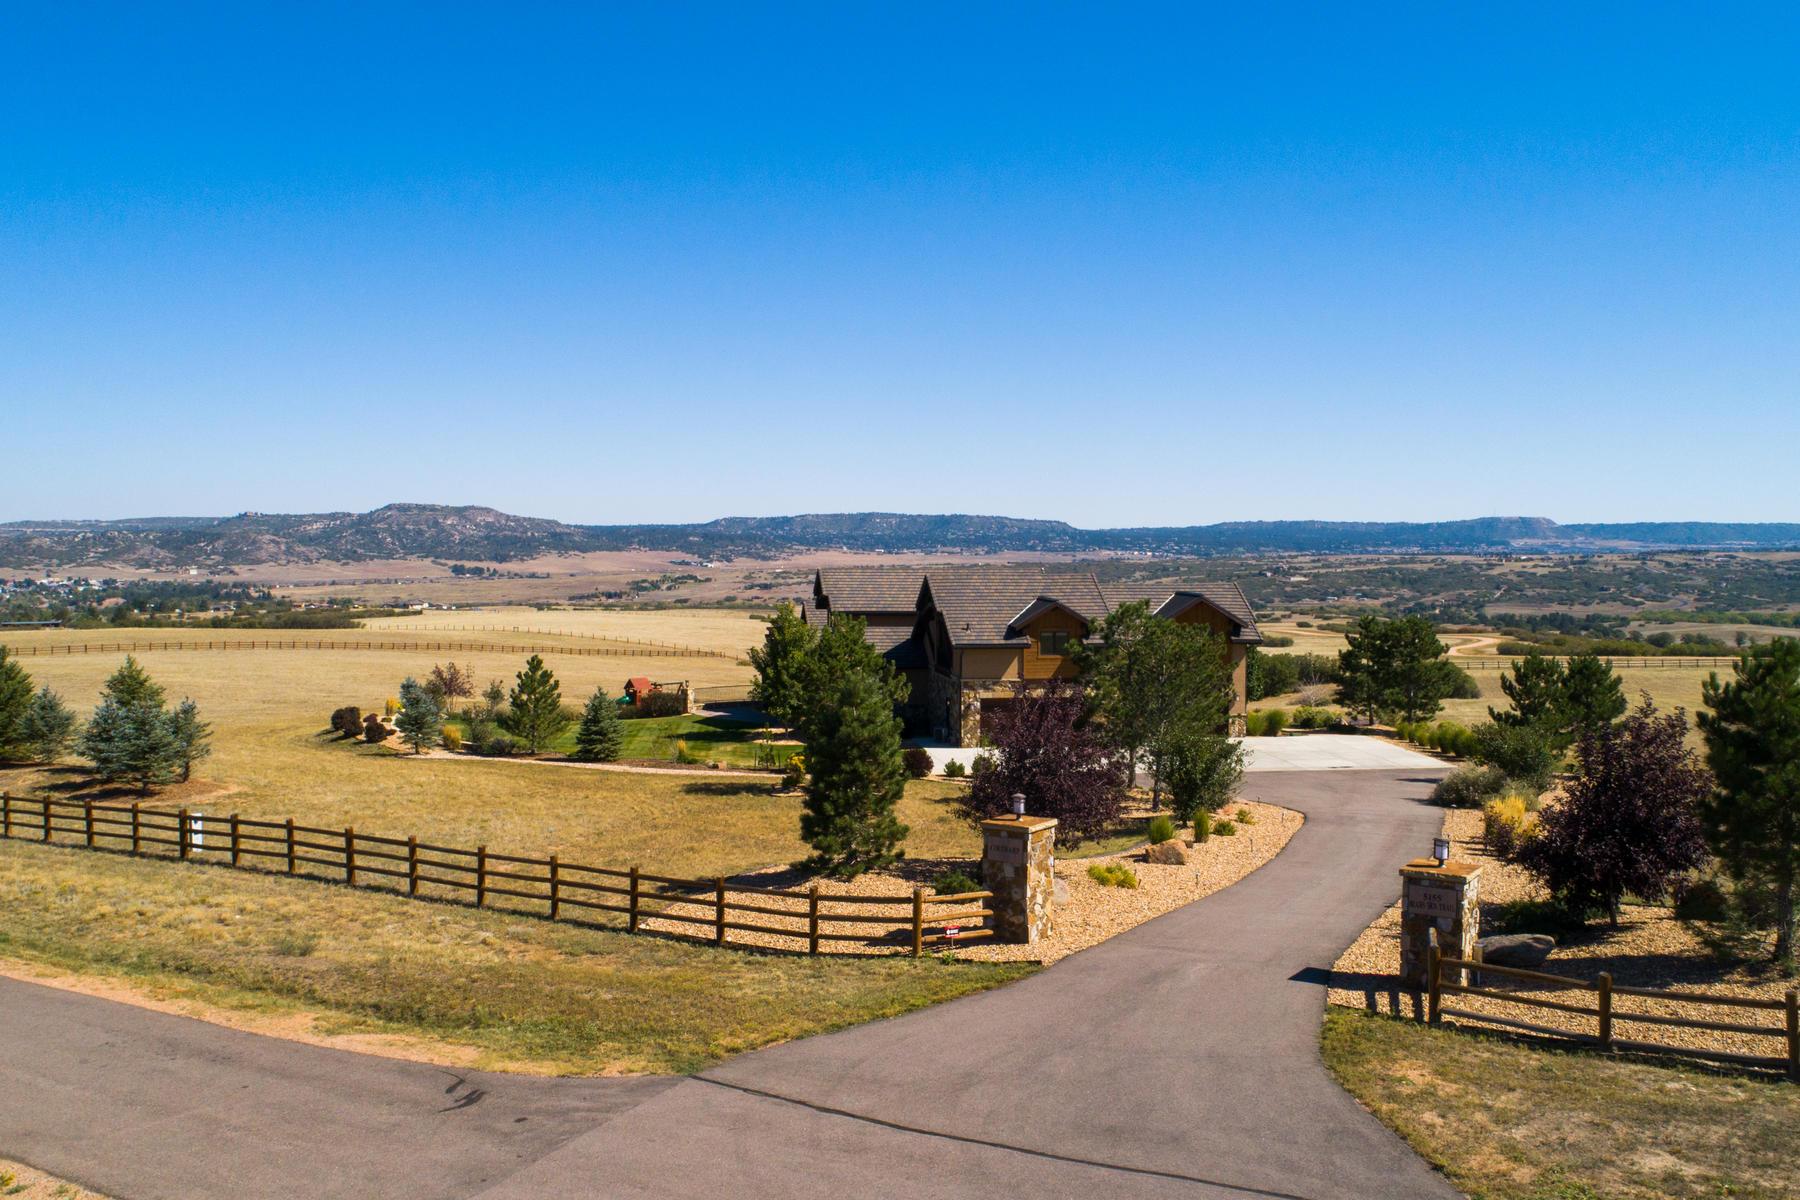 Additional photo for property listing at 5155 Bears Den Trl 5155 Bears Den Trl Sedalia, Colorado 80135 United States